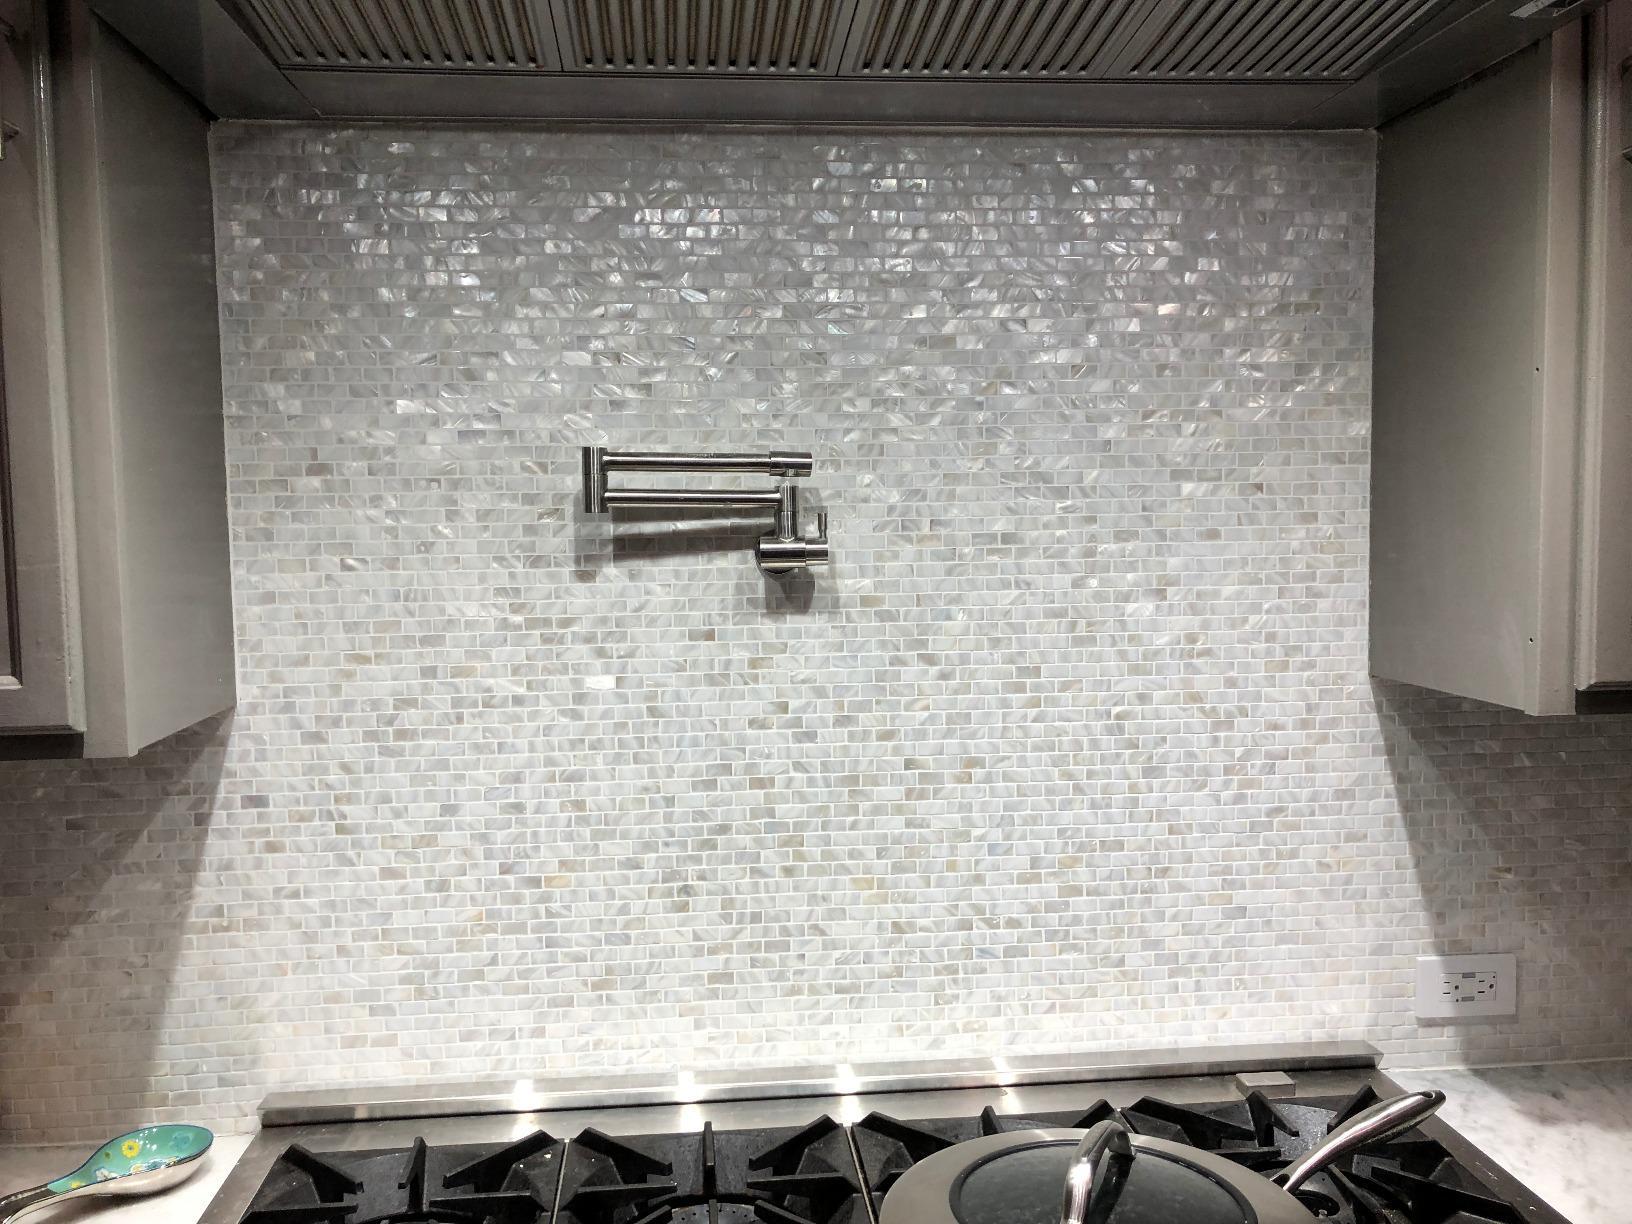 a18019 mother of pearl tile for kitchen backsplash 12 x12 subway white